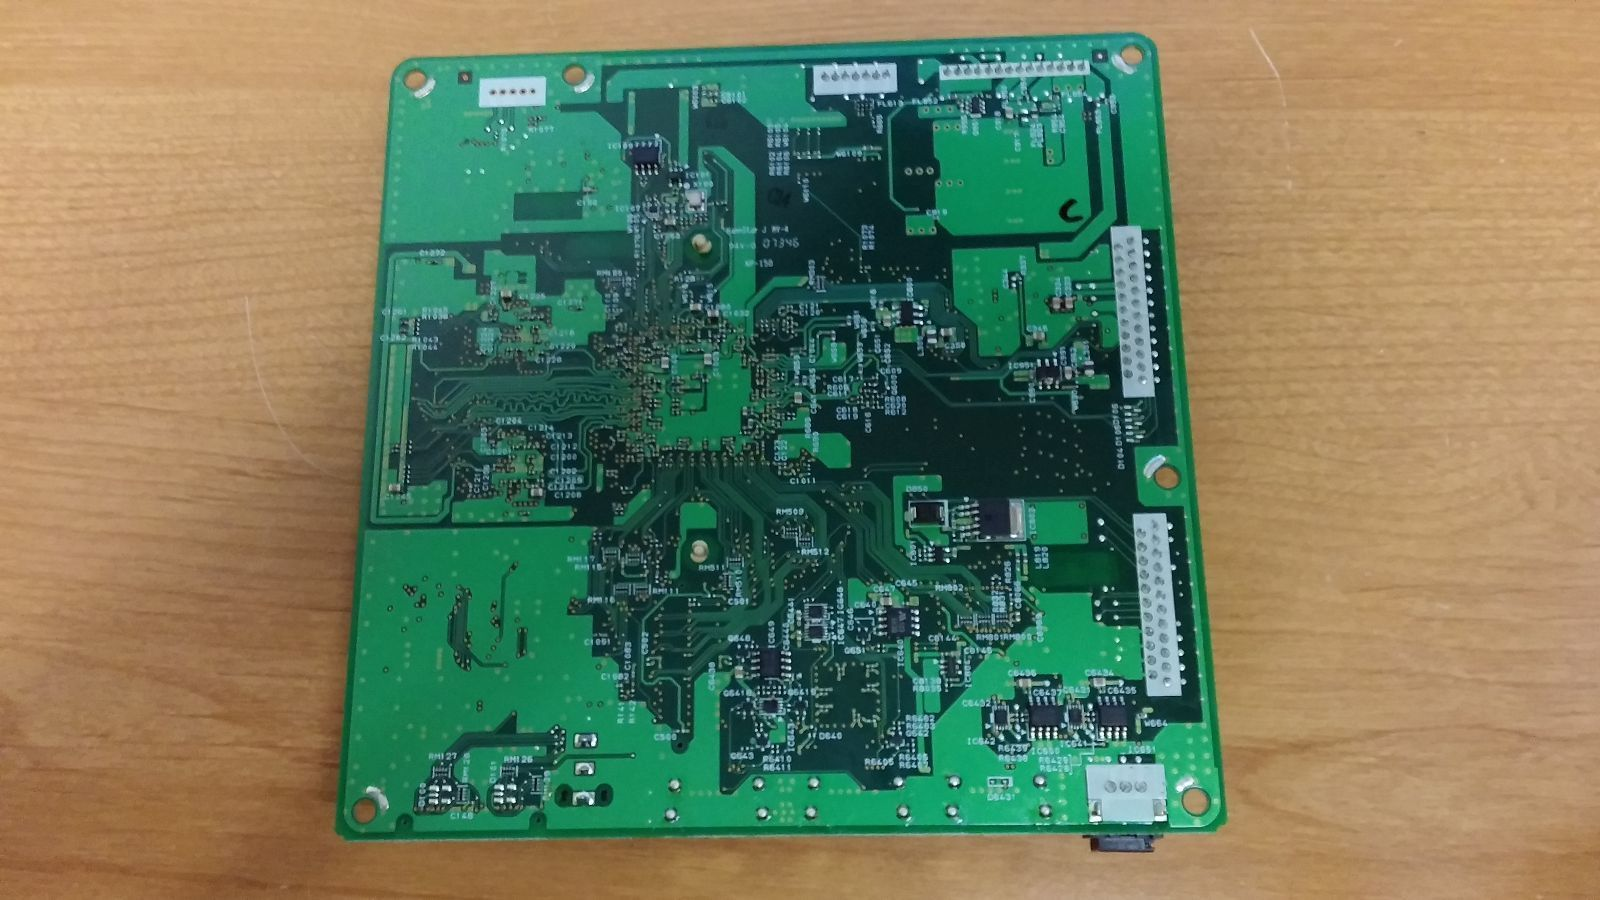 Toshiba 75008651 (PE0434A, V28A00054701) Seine Board